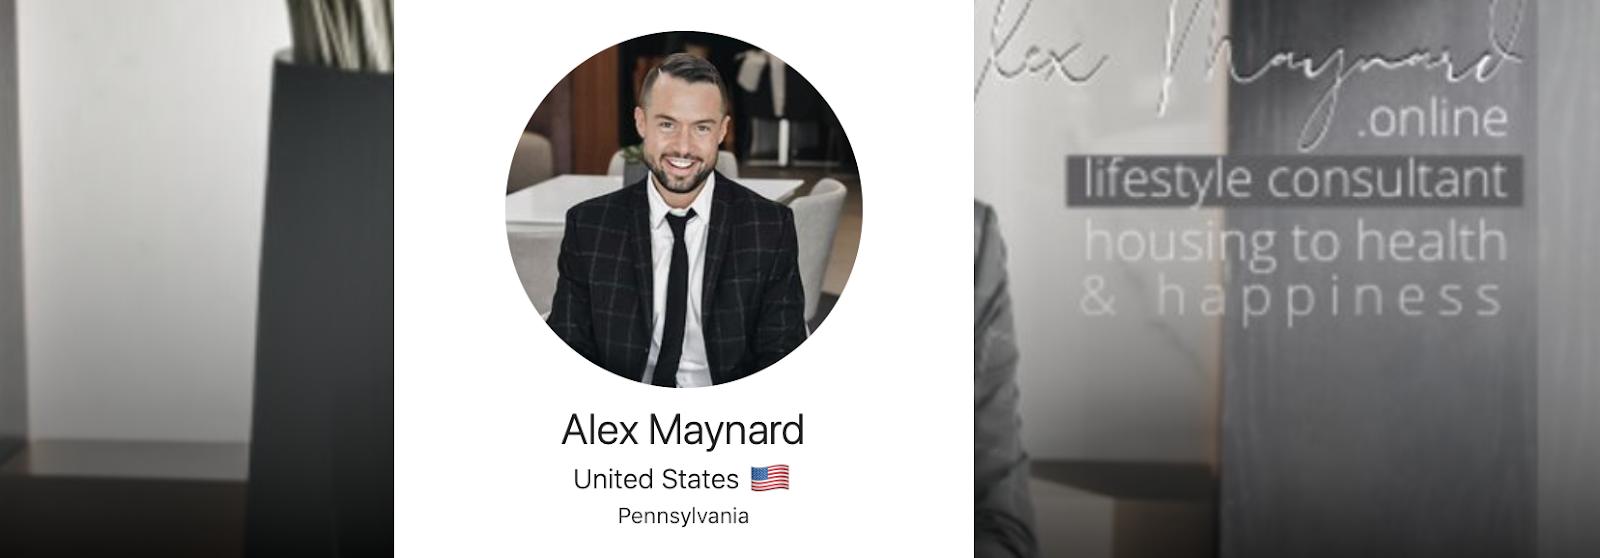 Alex Maynard   HR Micro-influencer featured on Afluencer